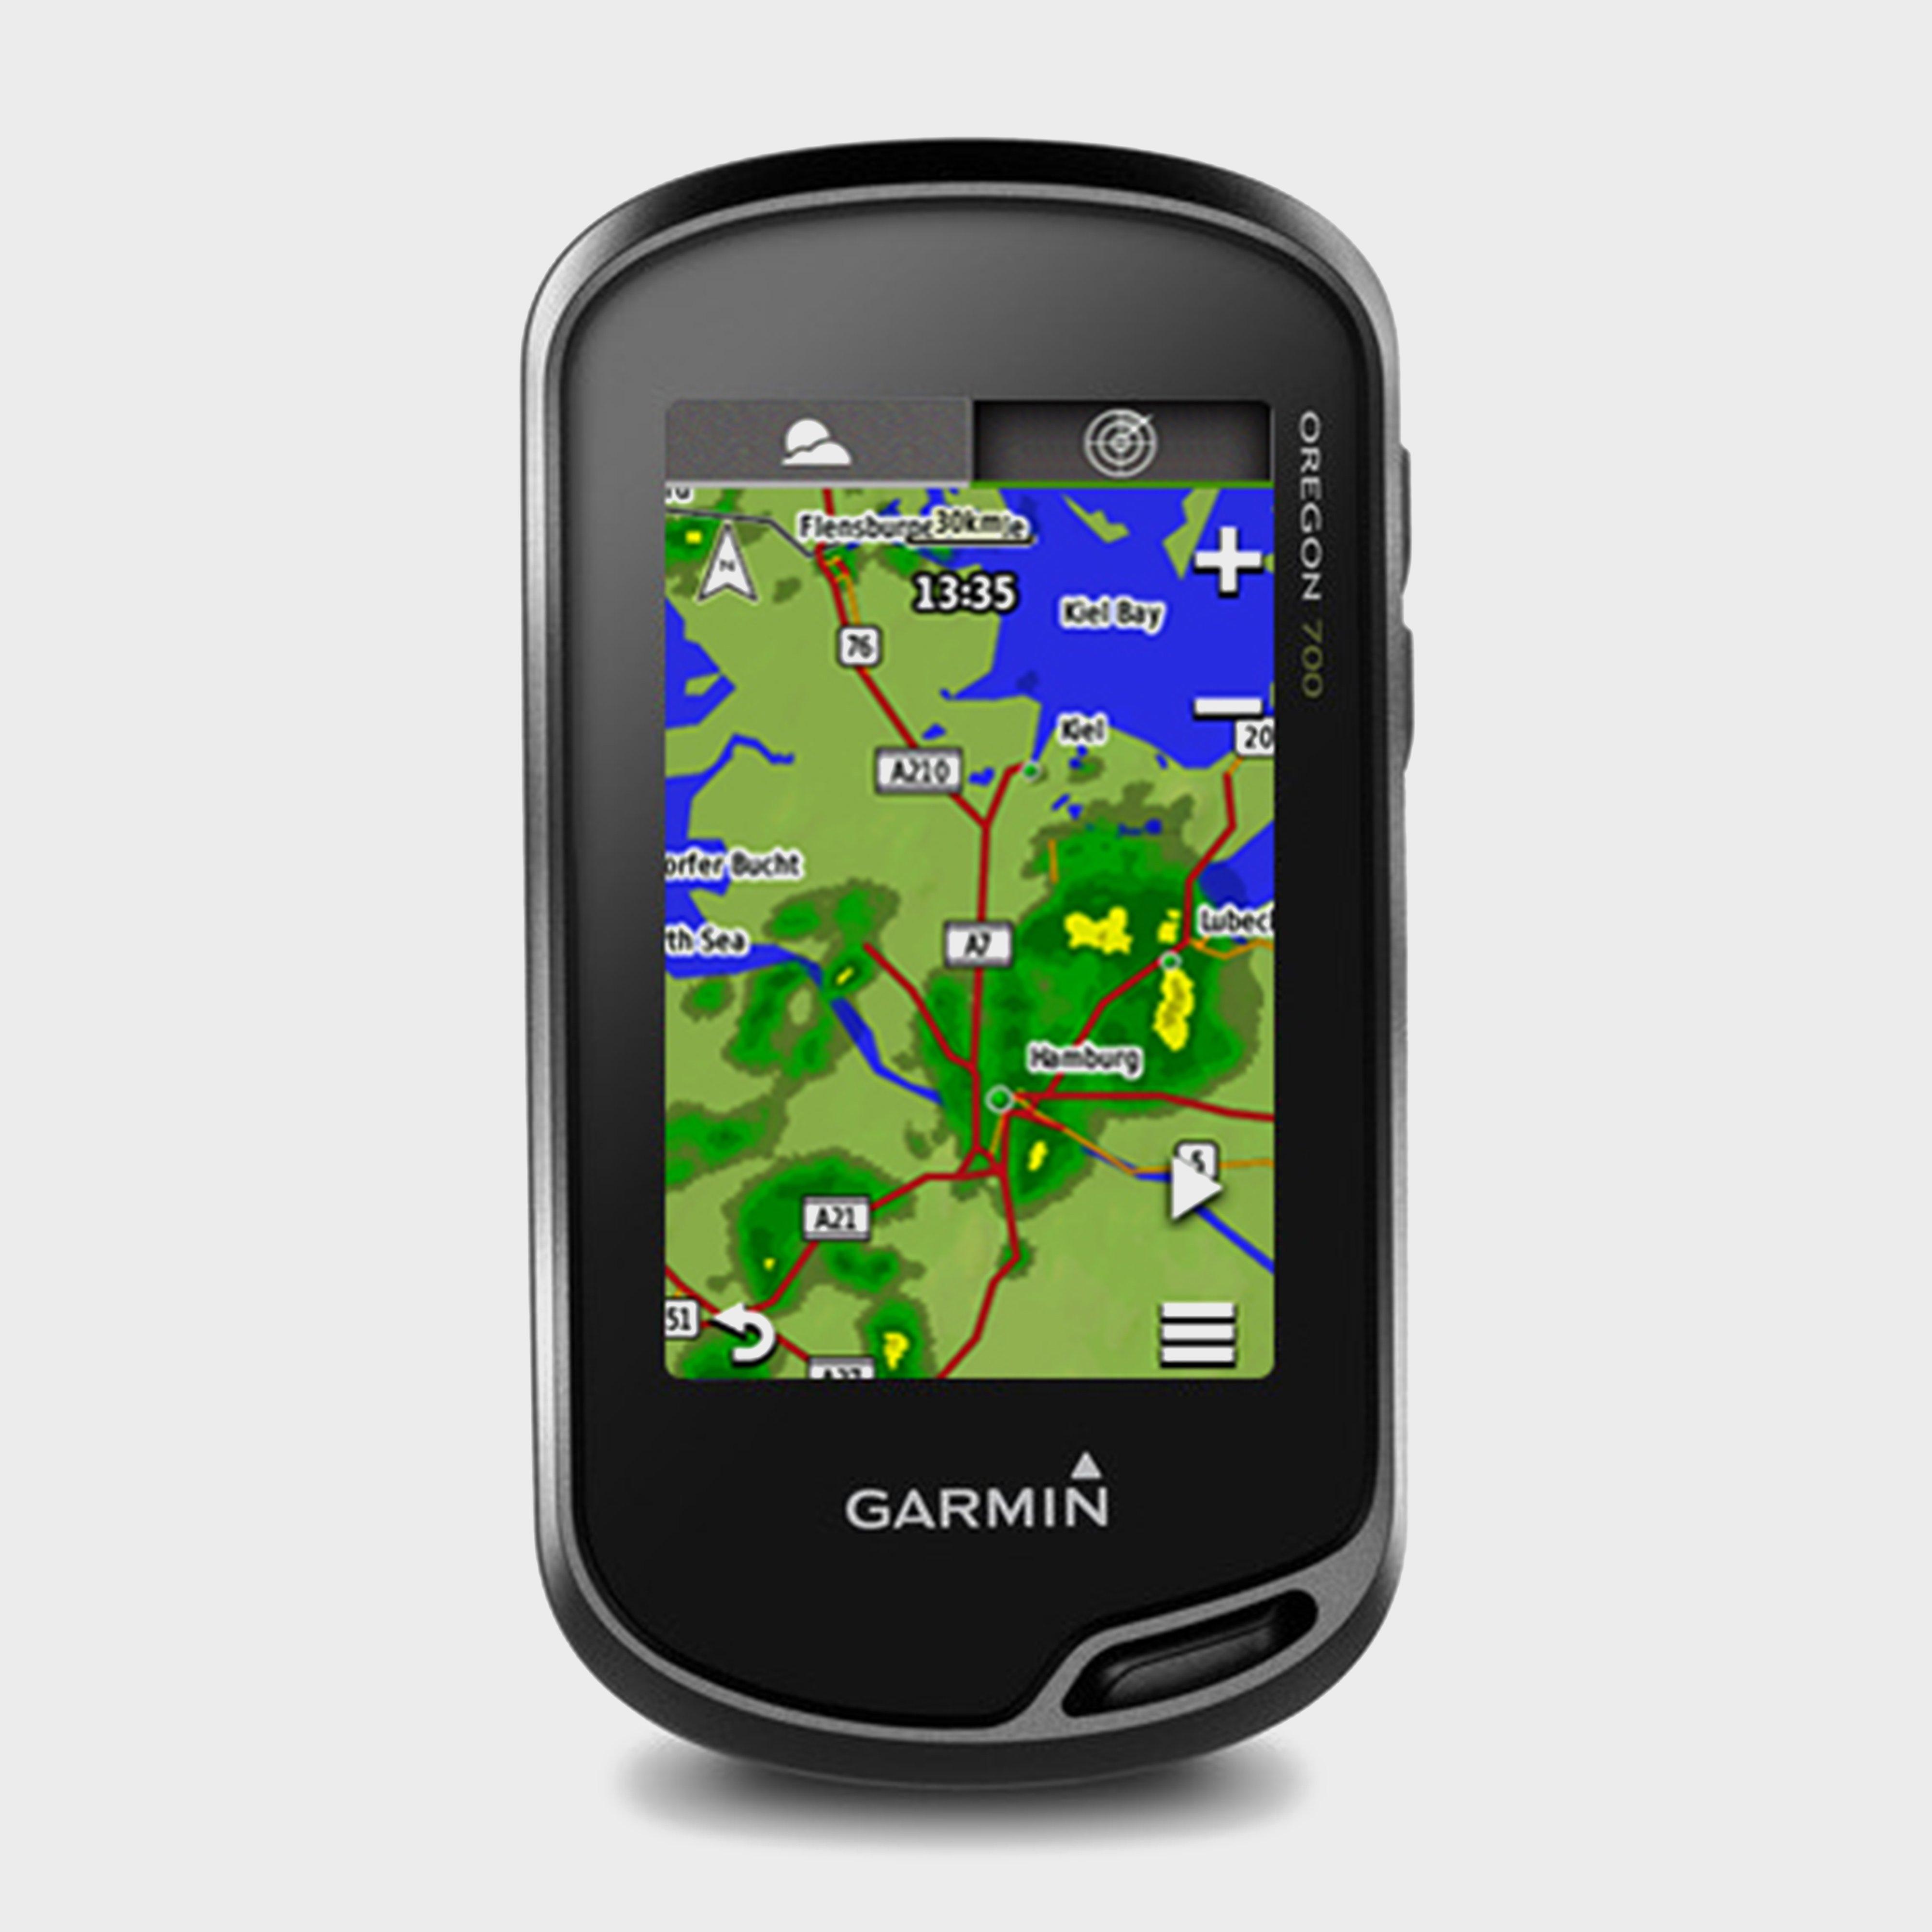 Garmin Oregon 700 Handheld GPS, Black